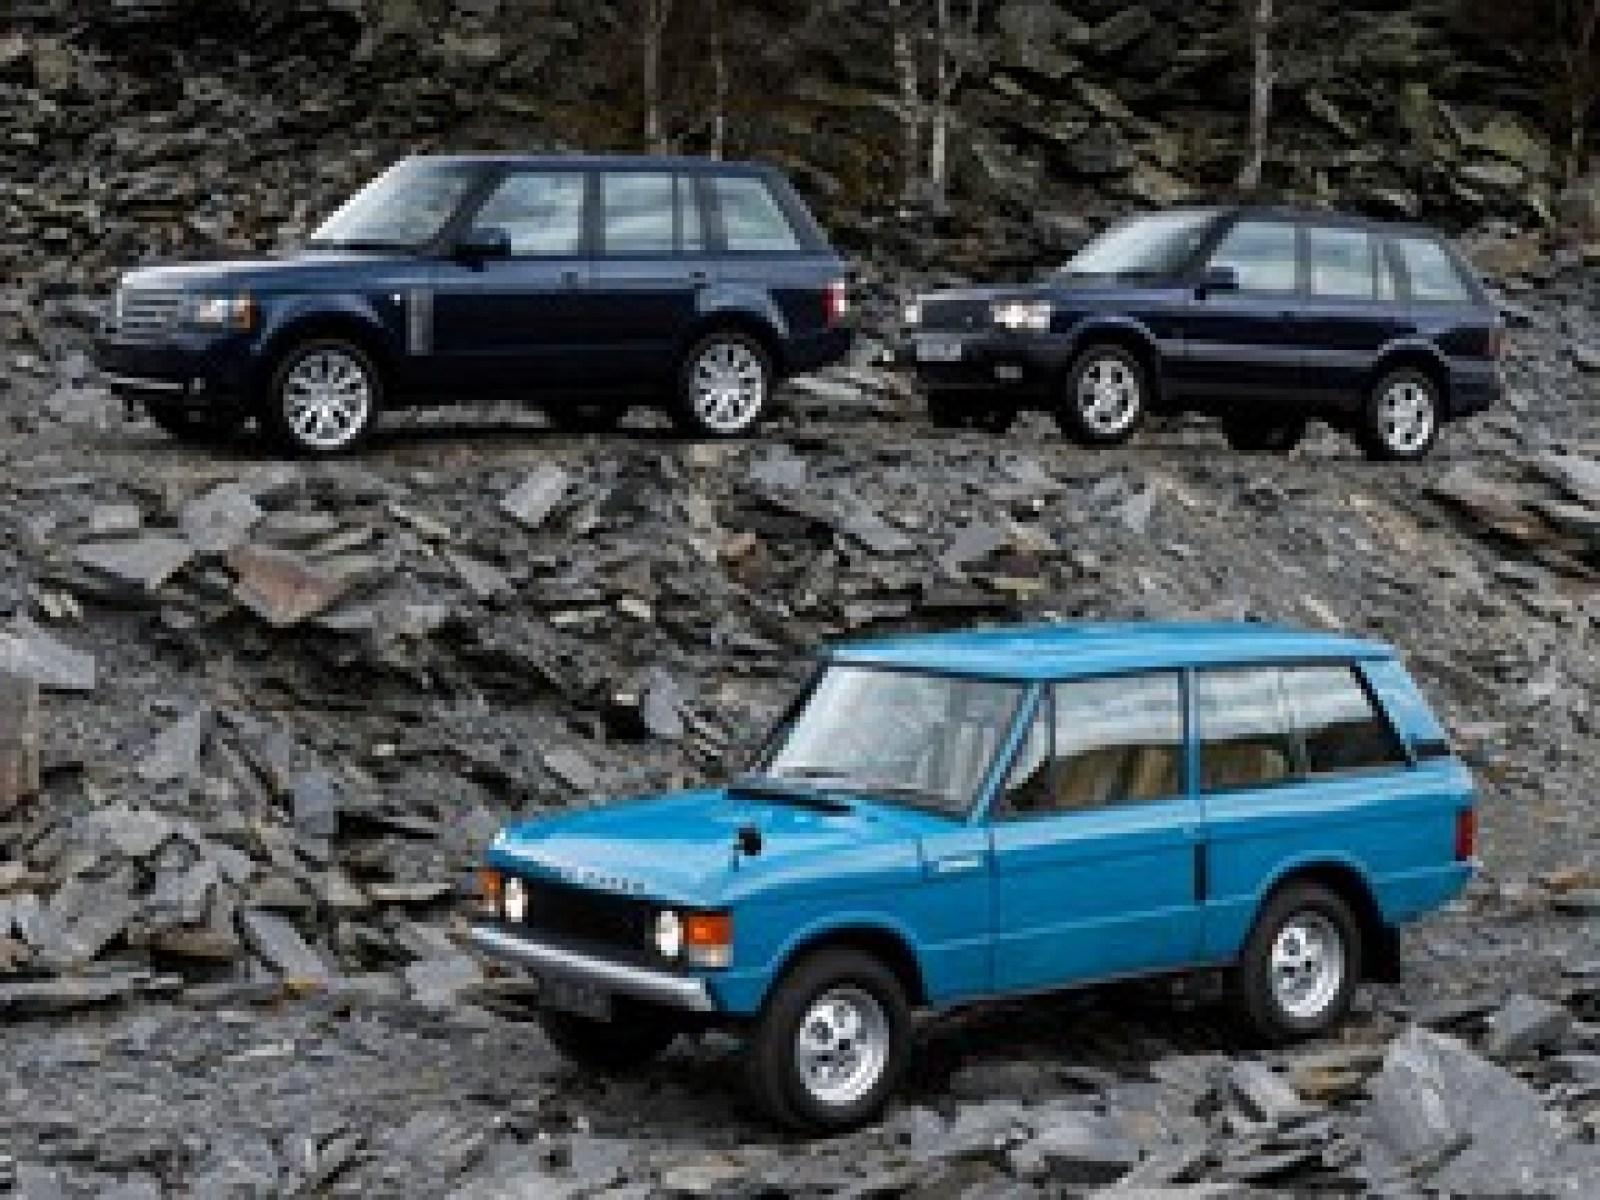 A trio of Land Rover Range Rovers